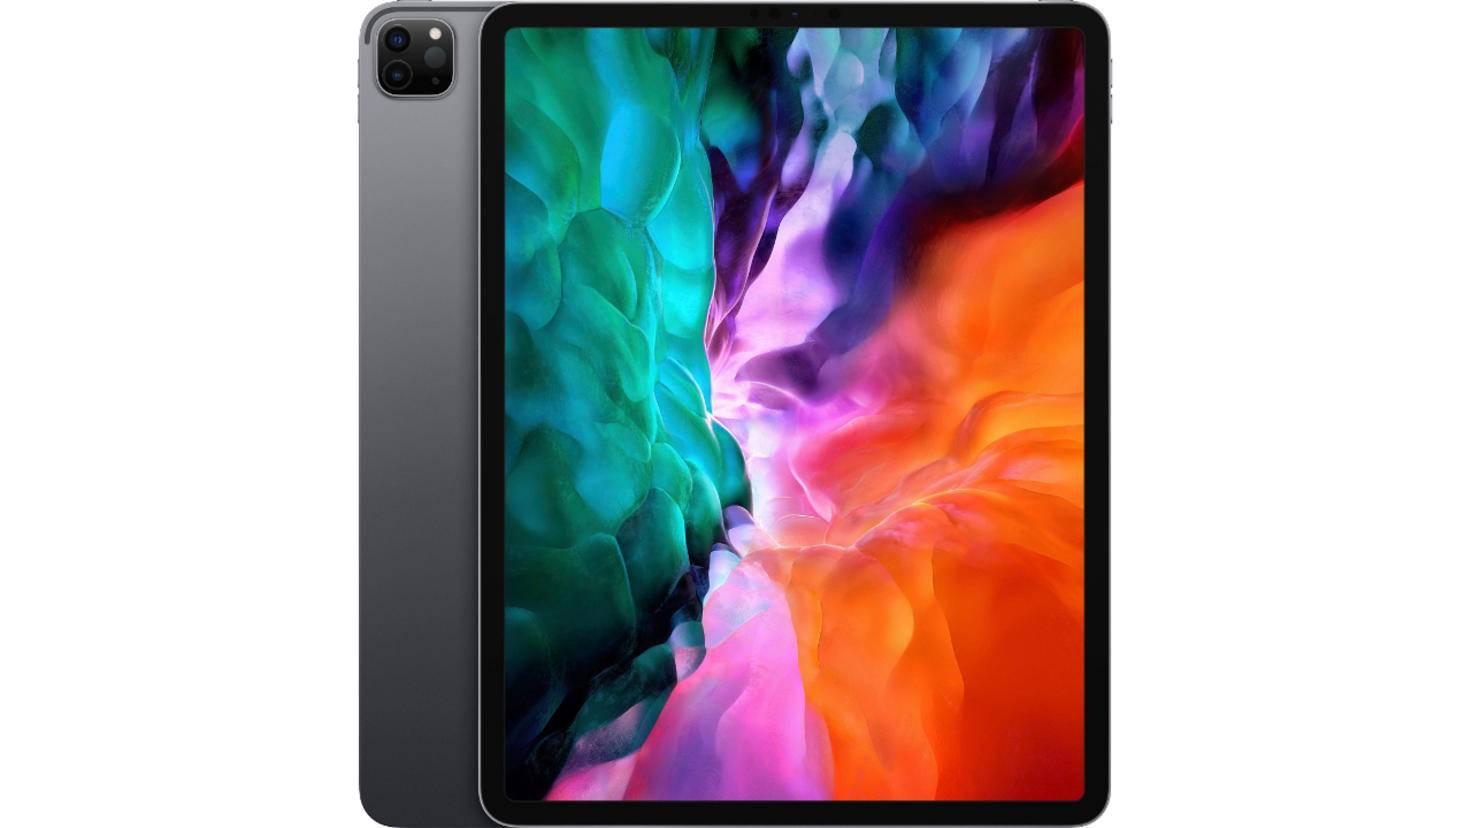 iPad Pro 12,9 Zoll